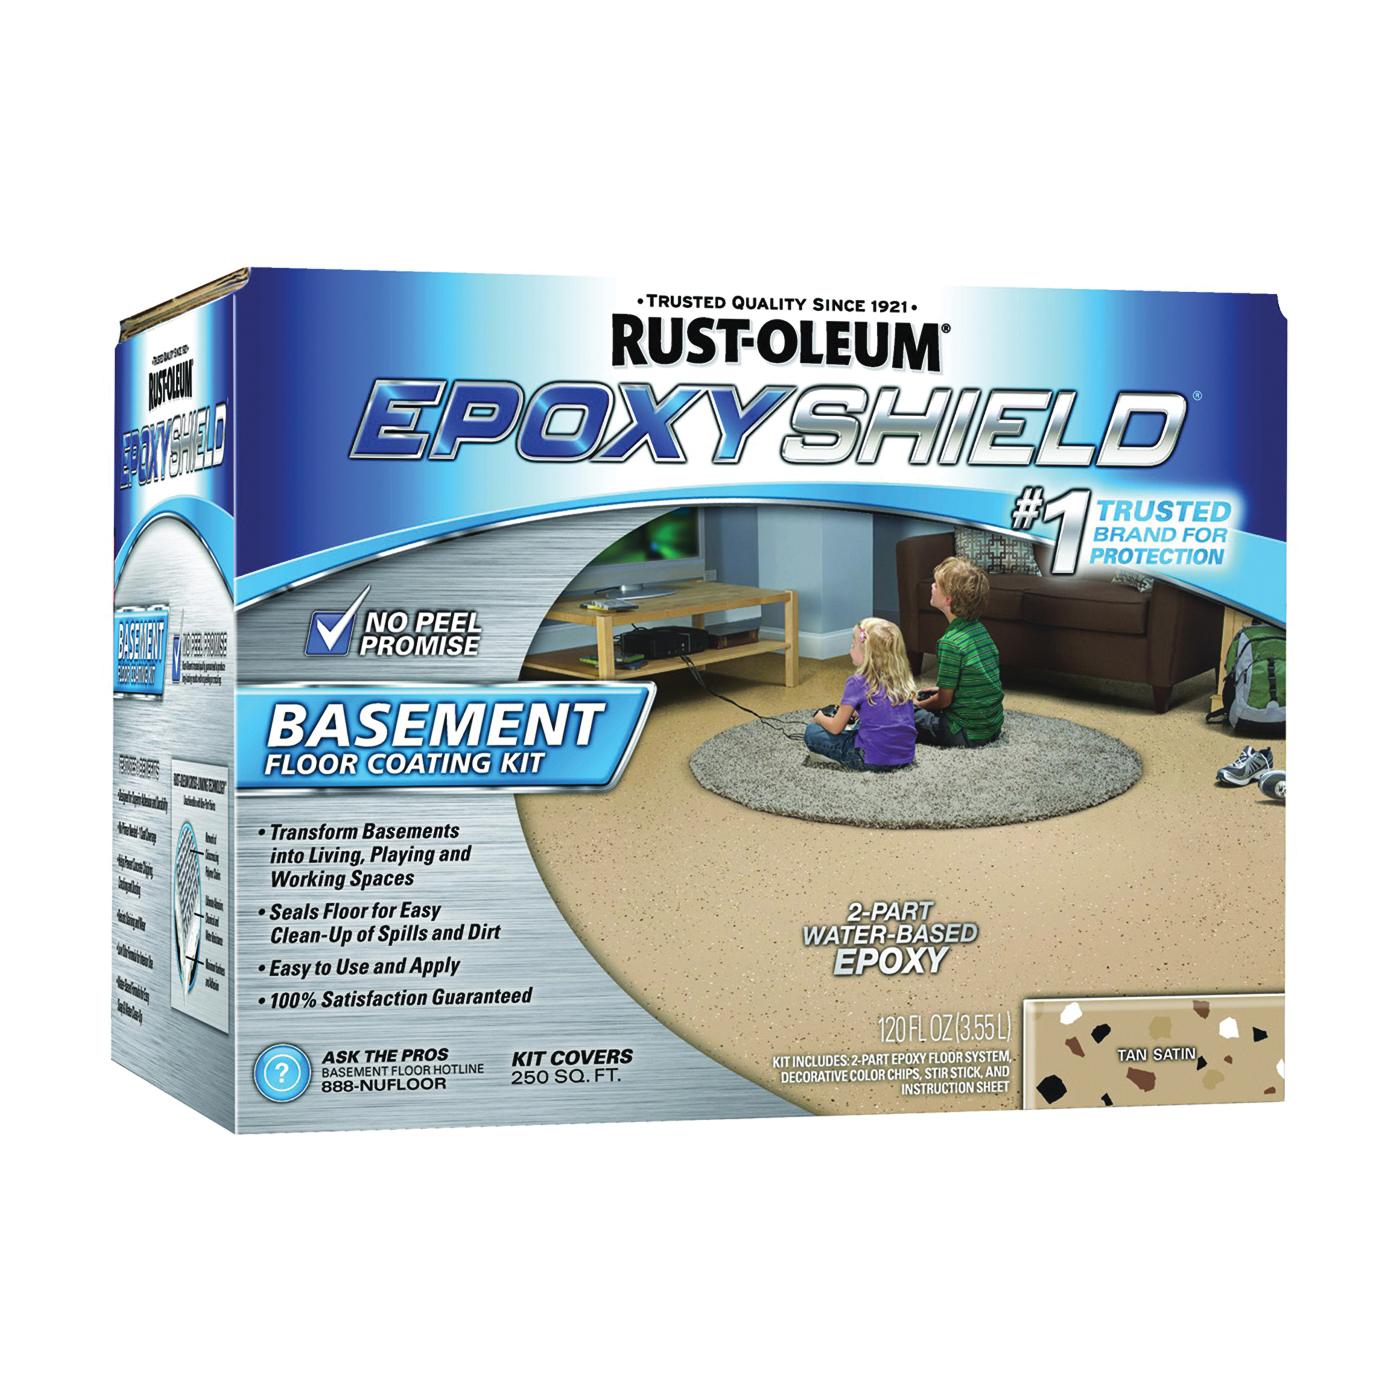 Picture of RUST-OLEUM EPOXYSHIELD 203008 Basement Floor Coating Kit, Satin, Tan, Liquid